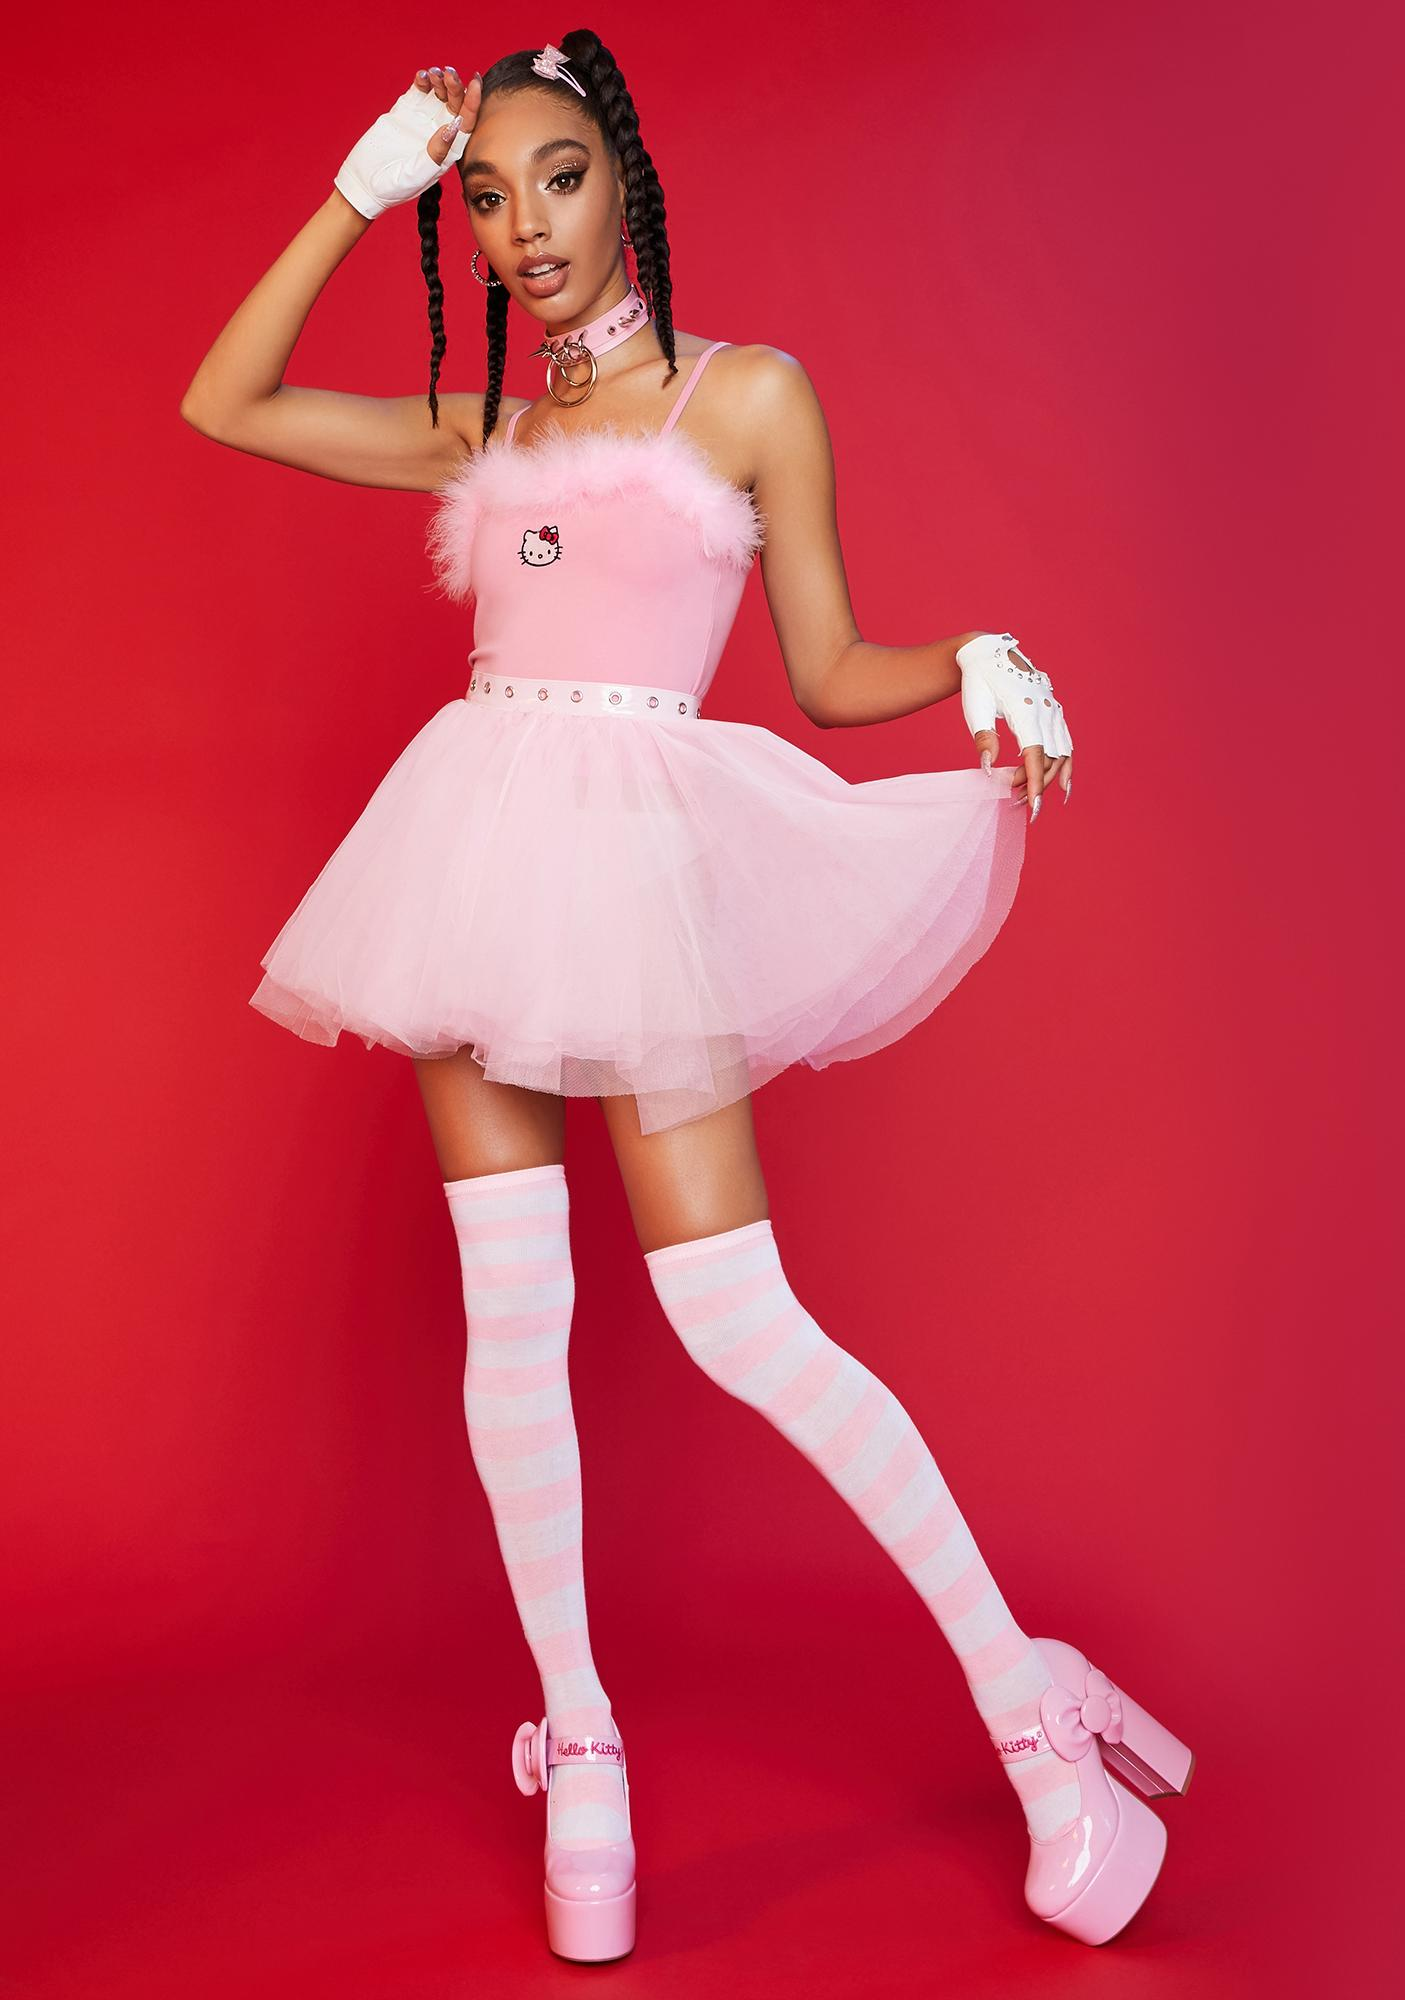 Dolls Kill x Hello Kitty Pretty Please Marabou Tank Top